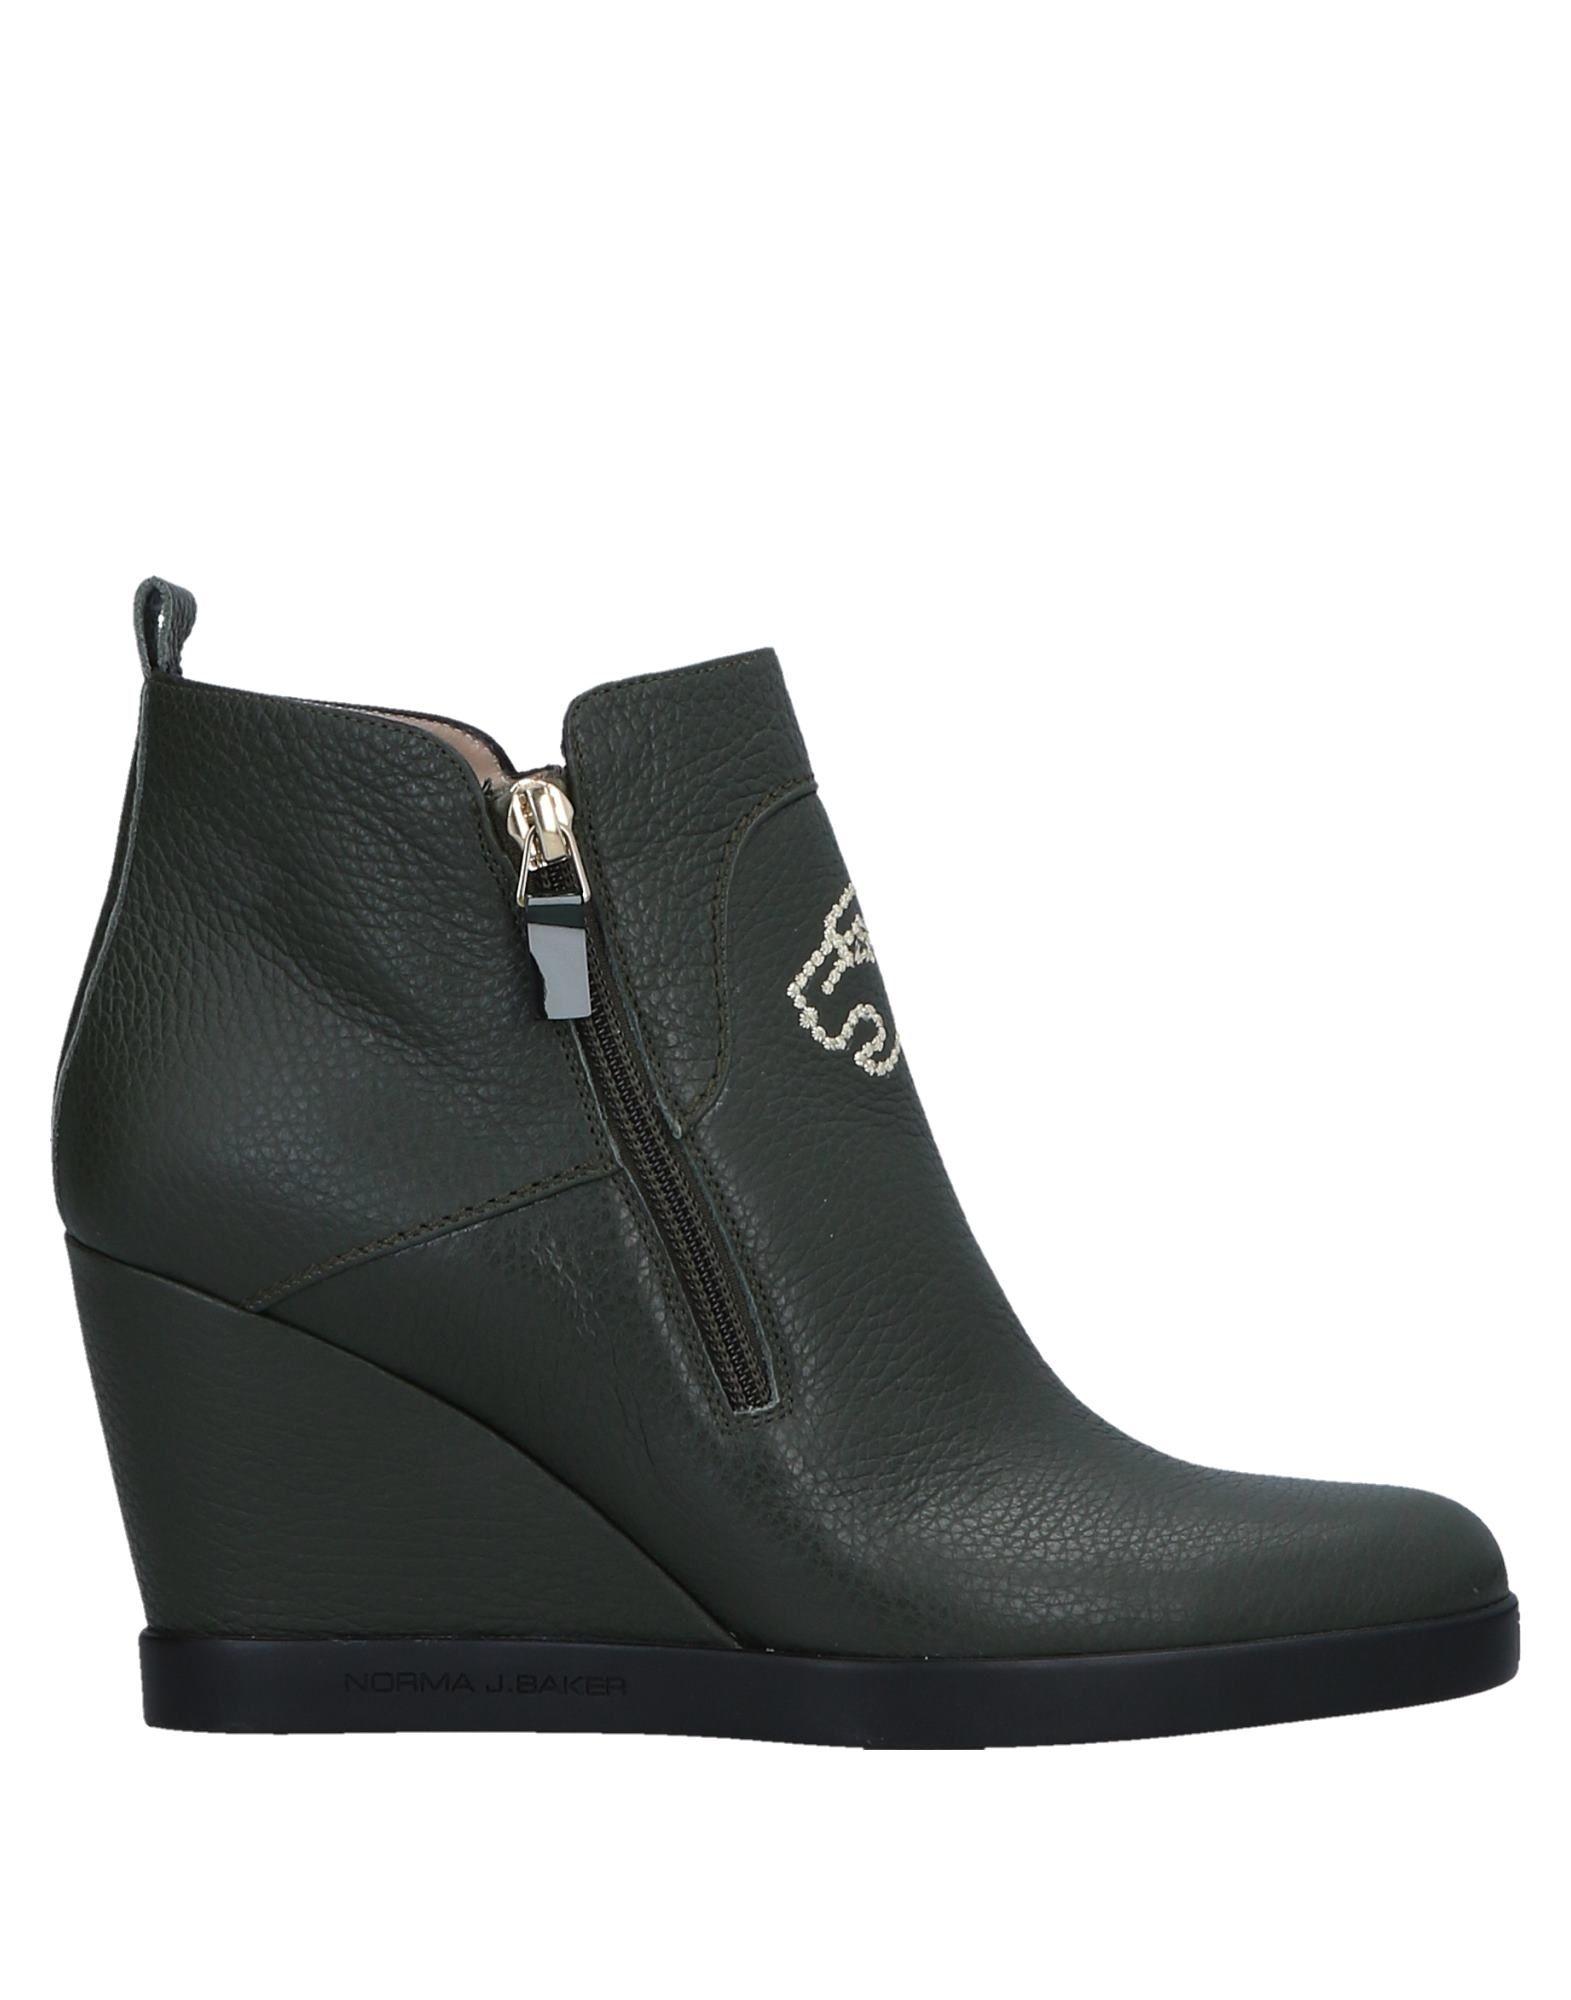 Norma J.Baker Stiefelette Damen  11516187TLGut aussehende strapazierfähige Schuhe